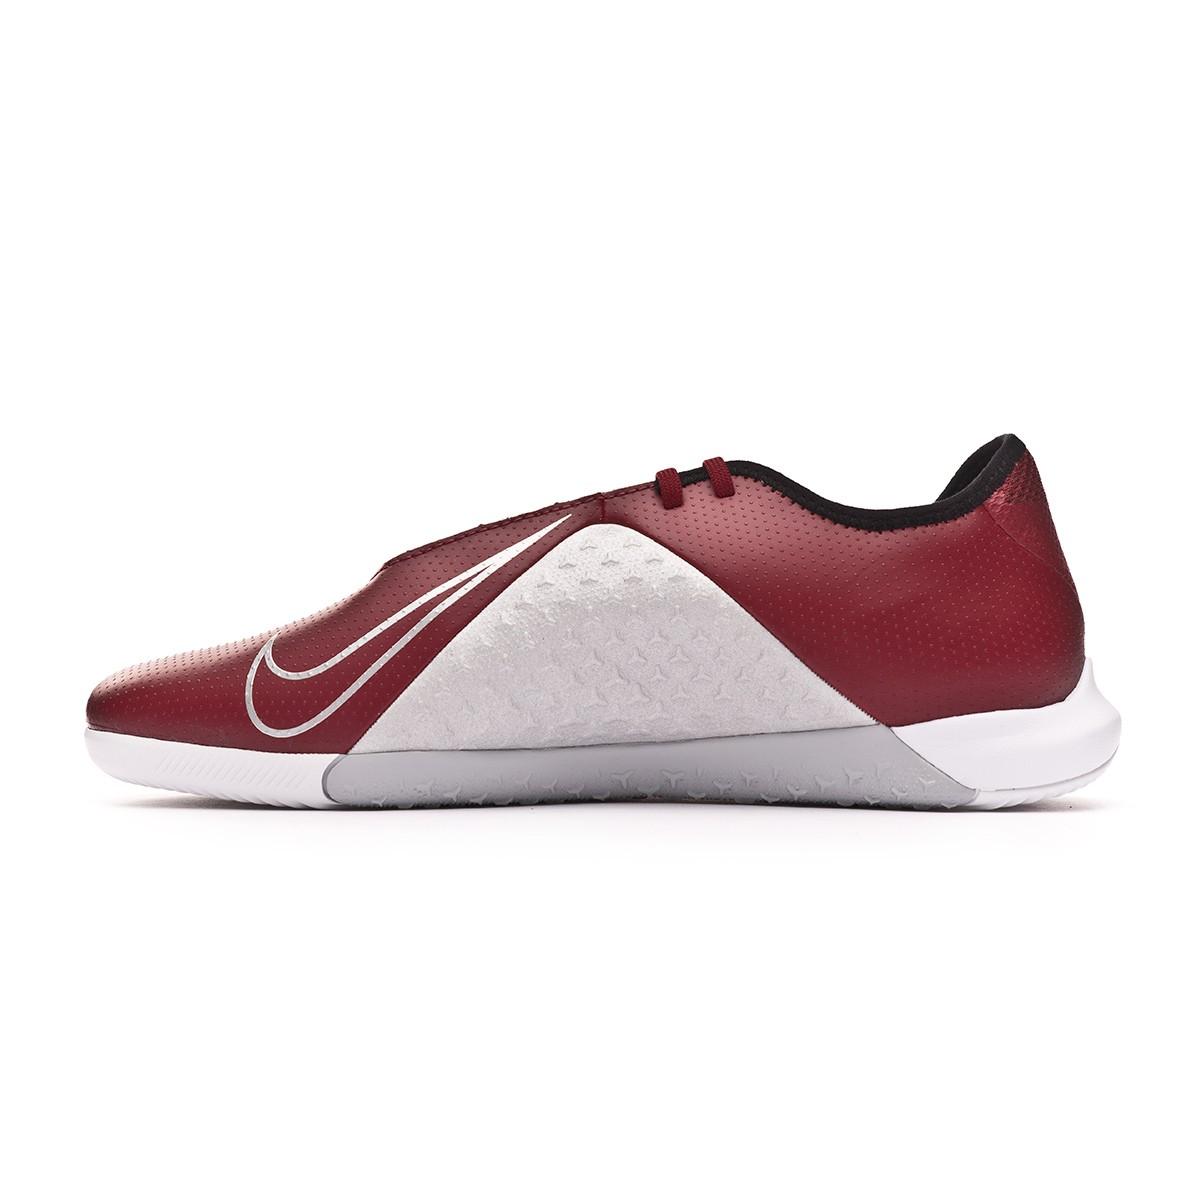 2262341f64c Futsal Boot Nike Phantom Vision Academy IC Team red-Metallic dark  grey-Metallic silver - Football store Fútbol Emotion